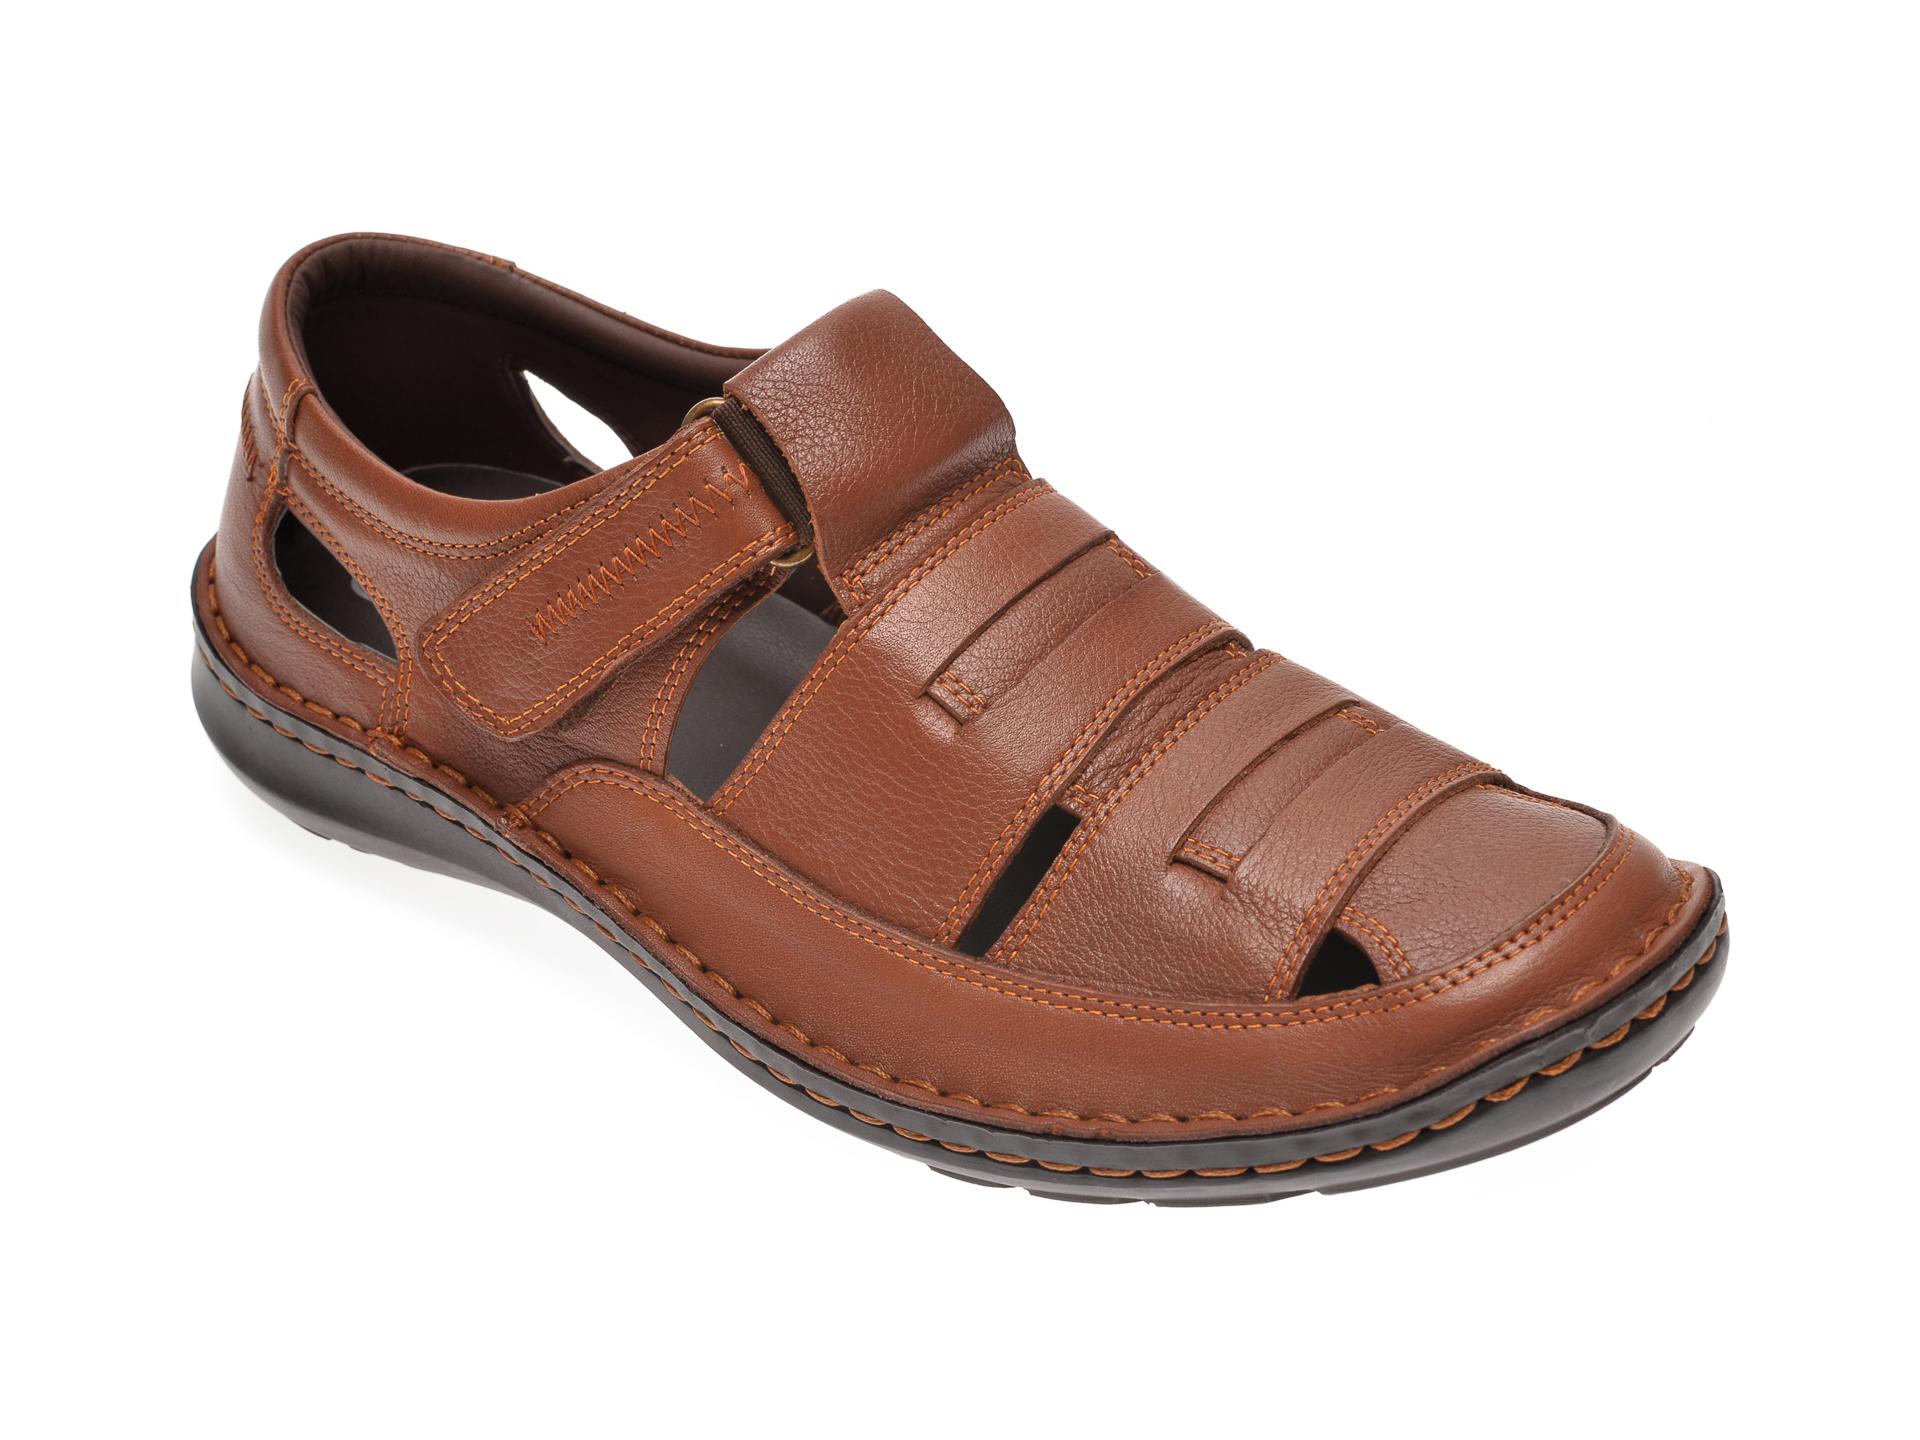 Sandale OTTER maro, 9562, din piele naturala imagine